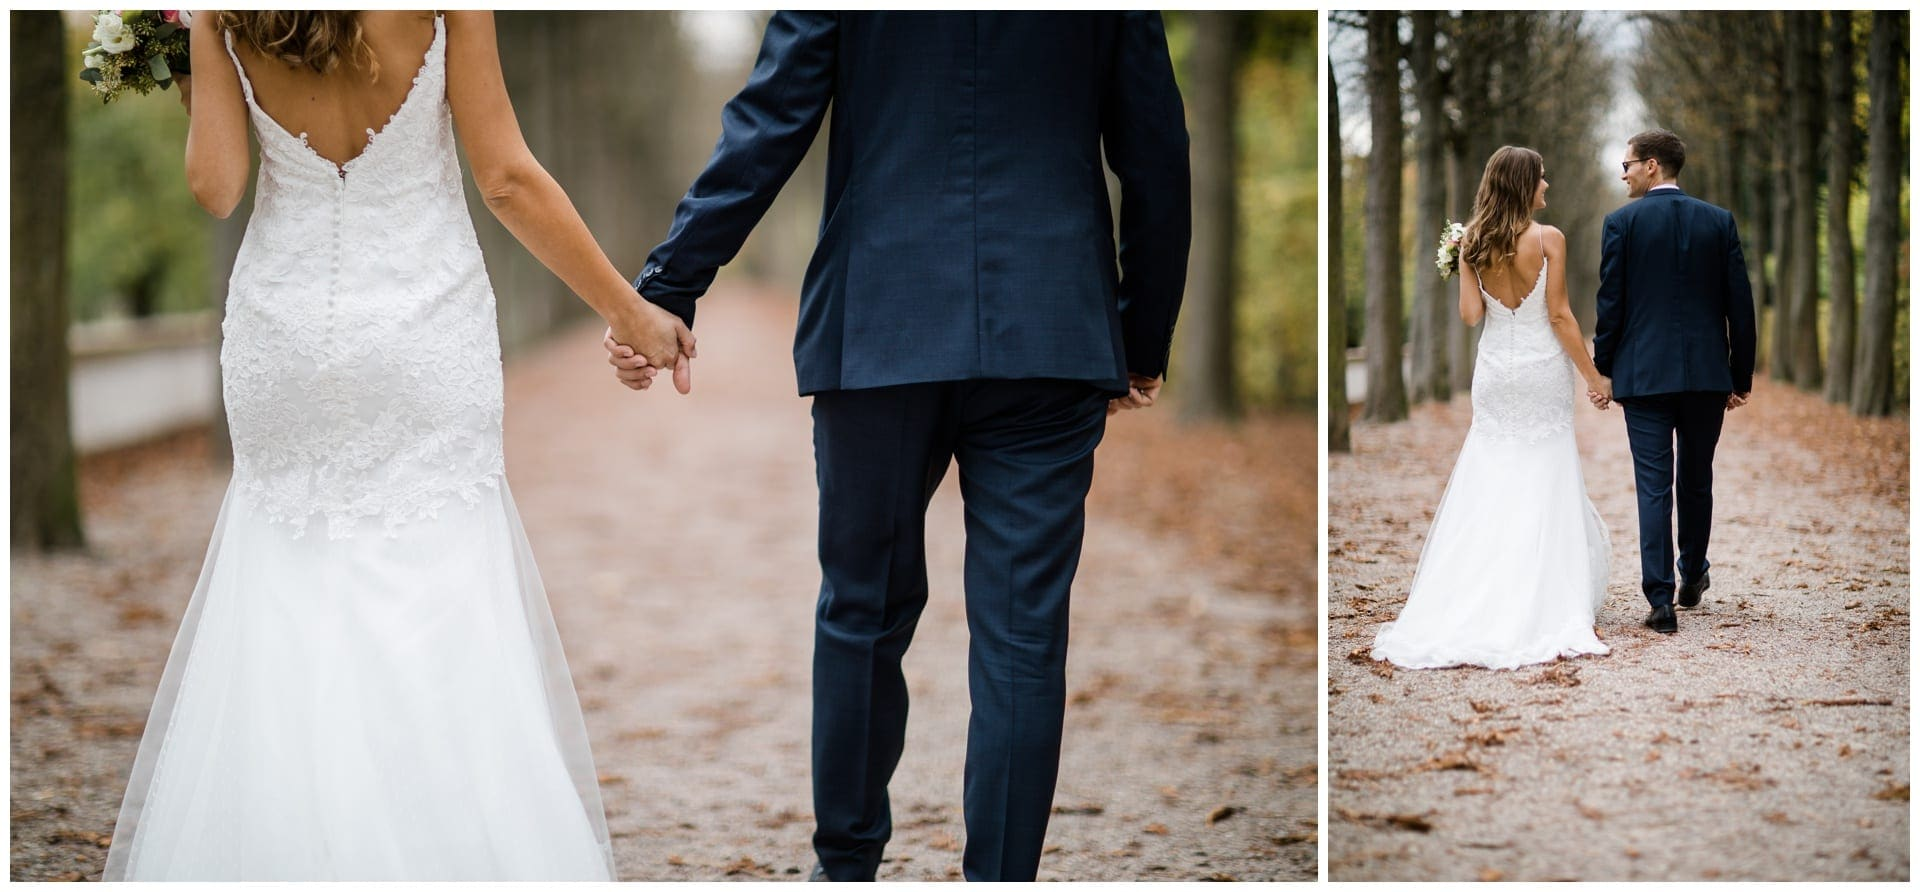 Caroline und Andreas @mama wedding 59